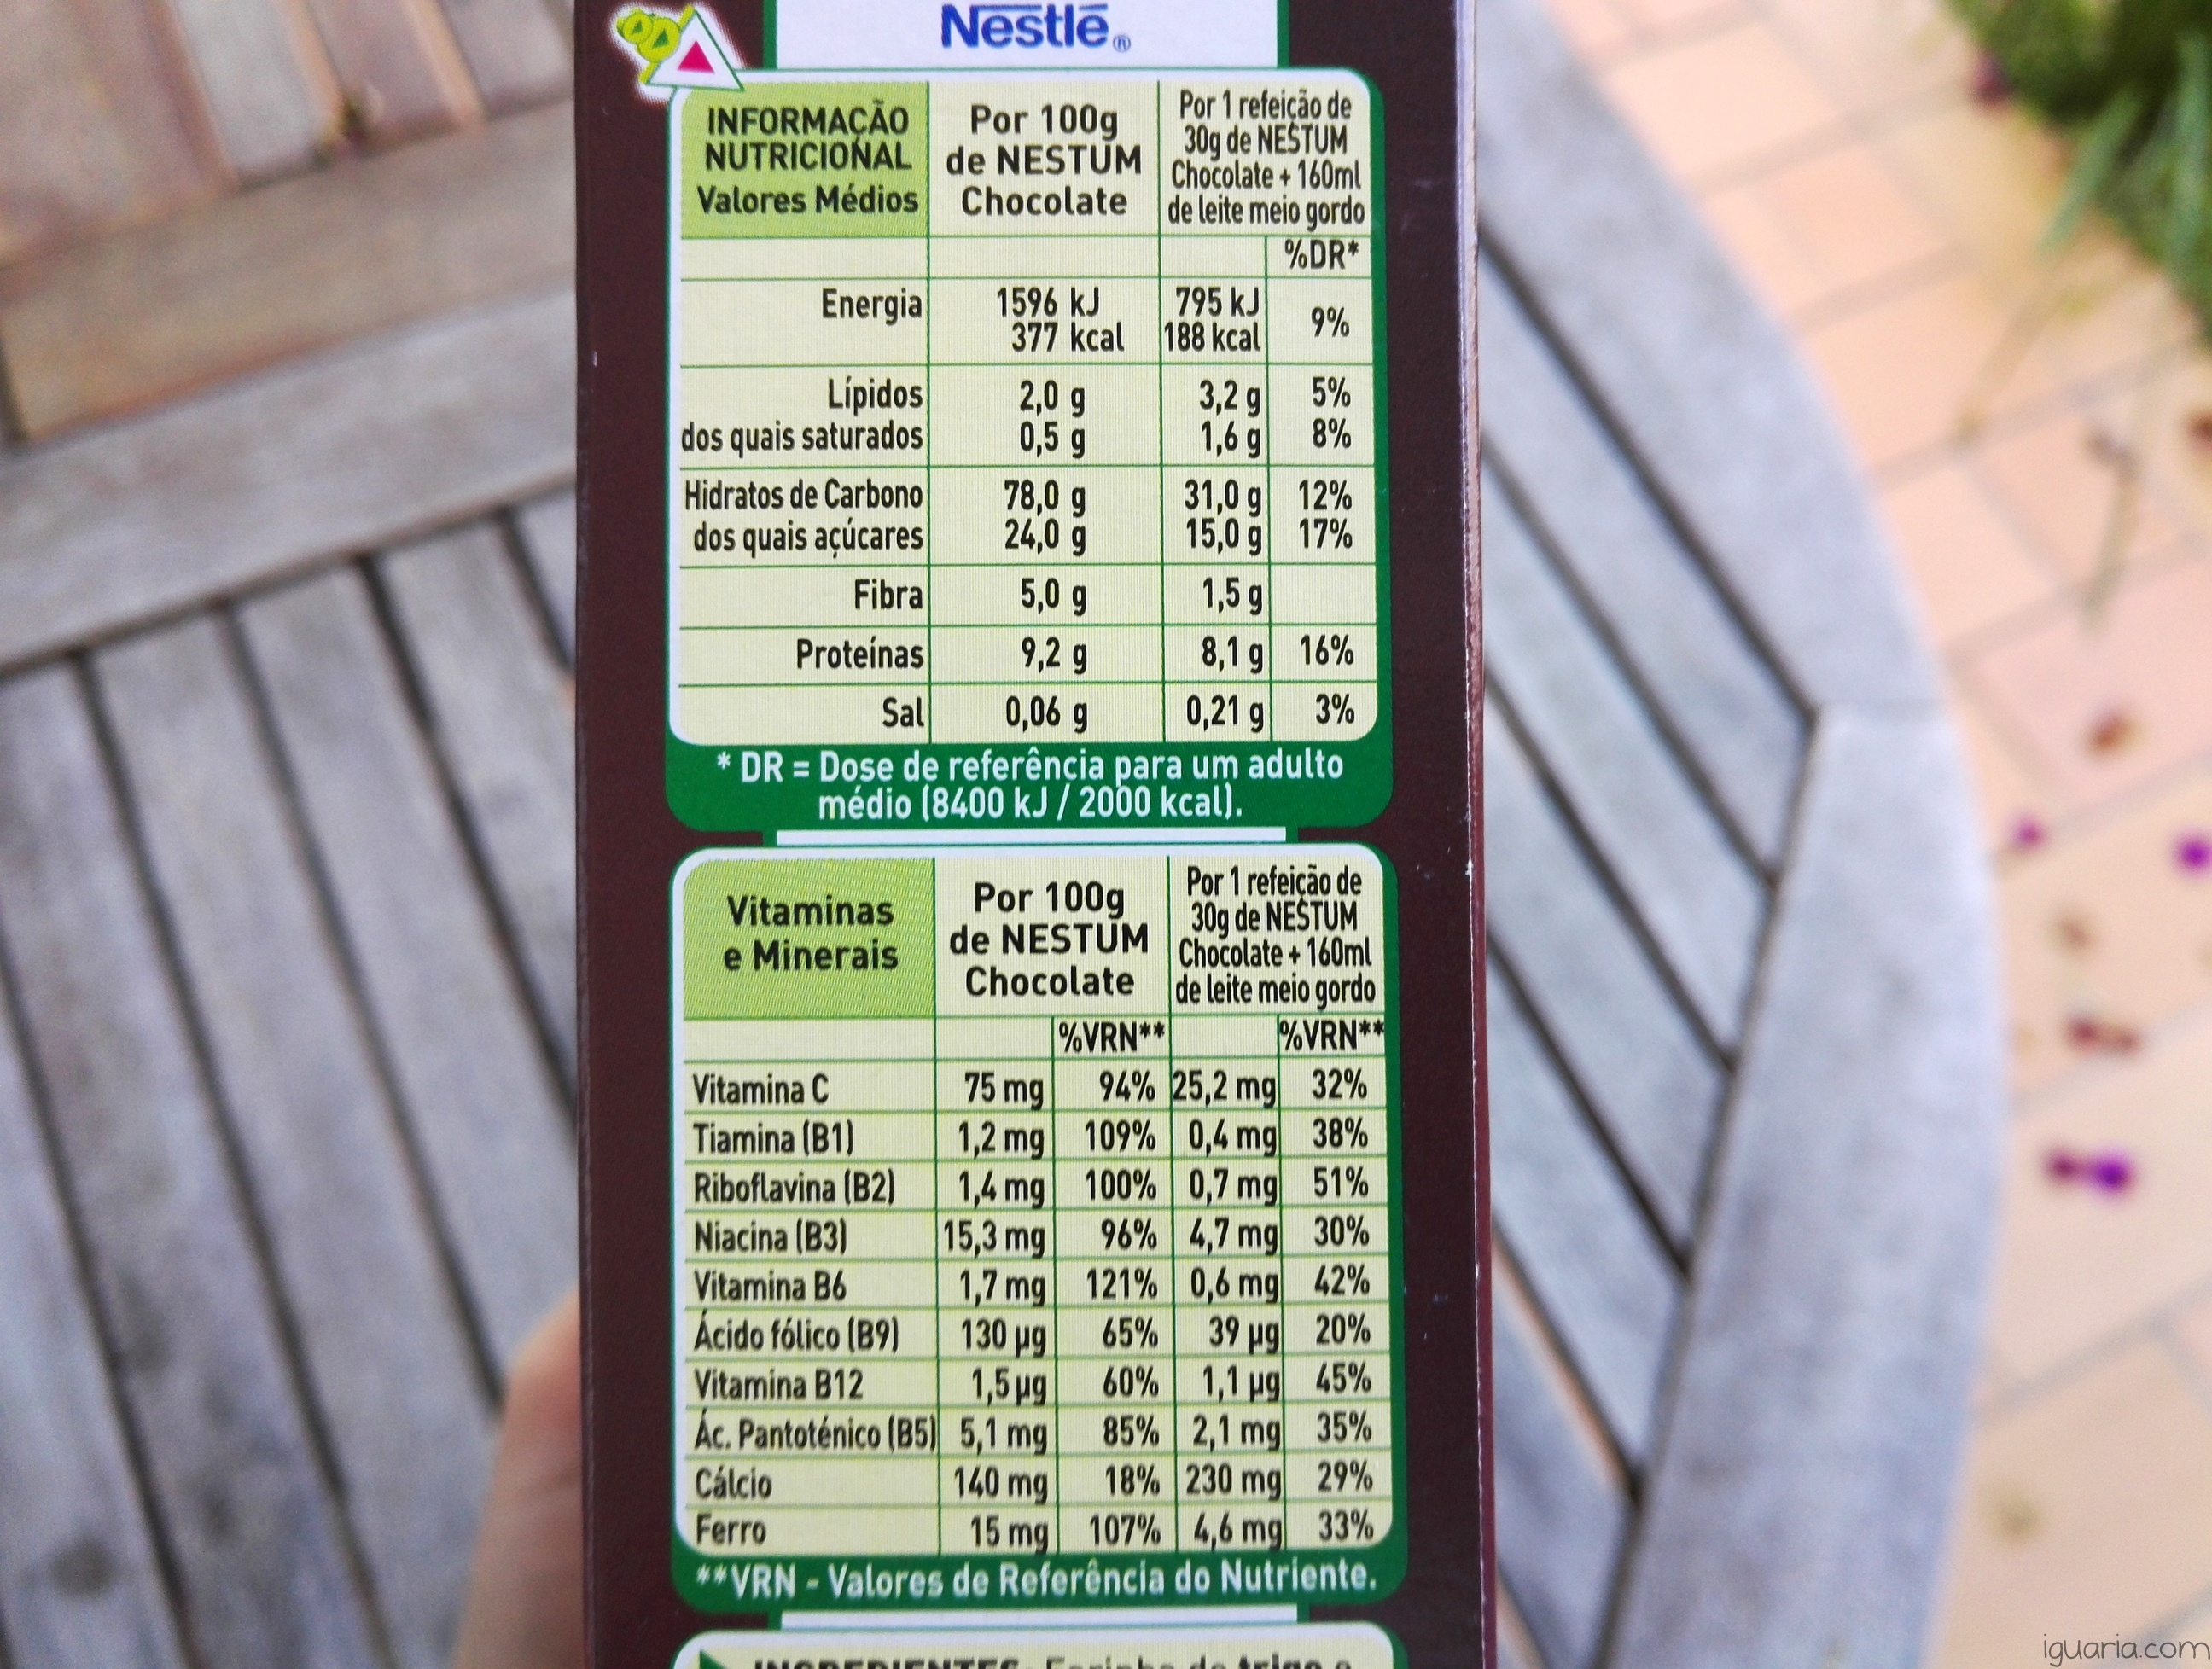 Iguaria_Nestum-Chocolate-Informacoes-Nutricionais